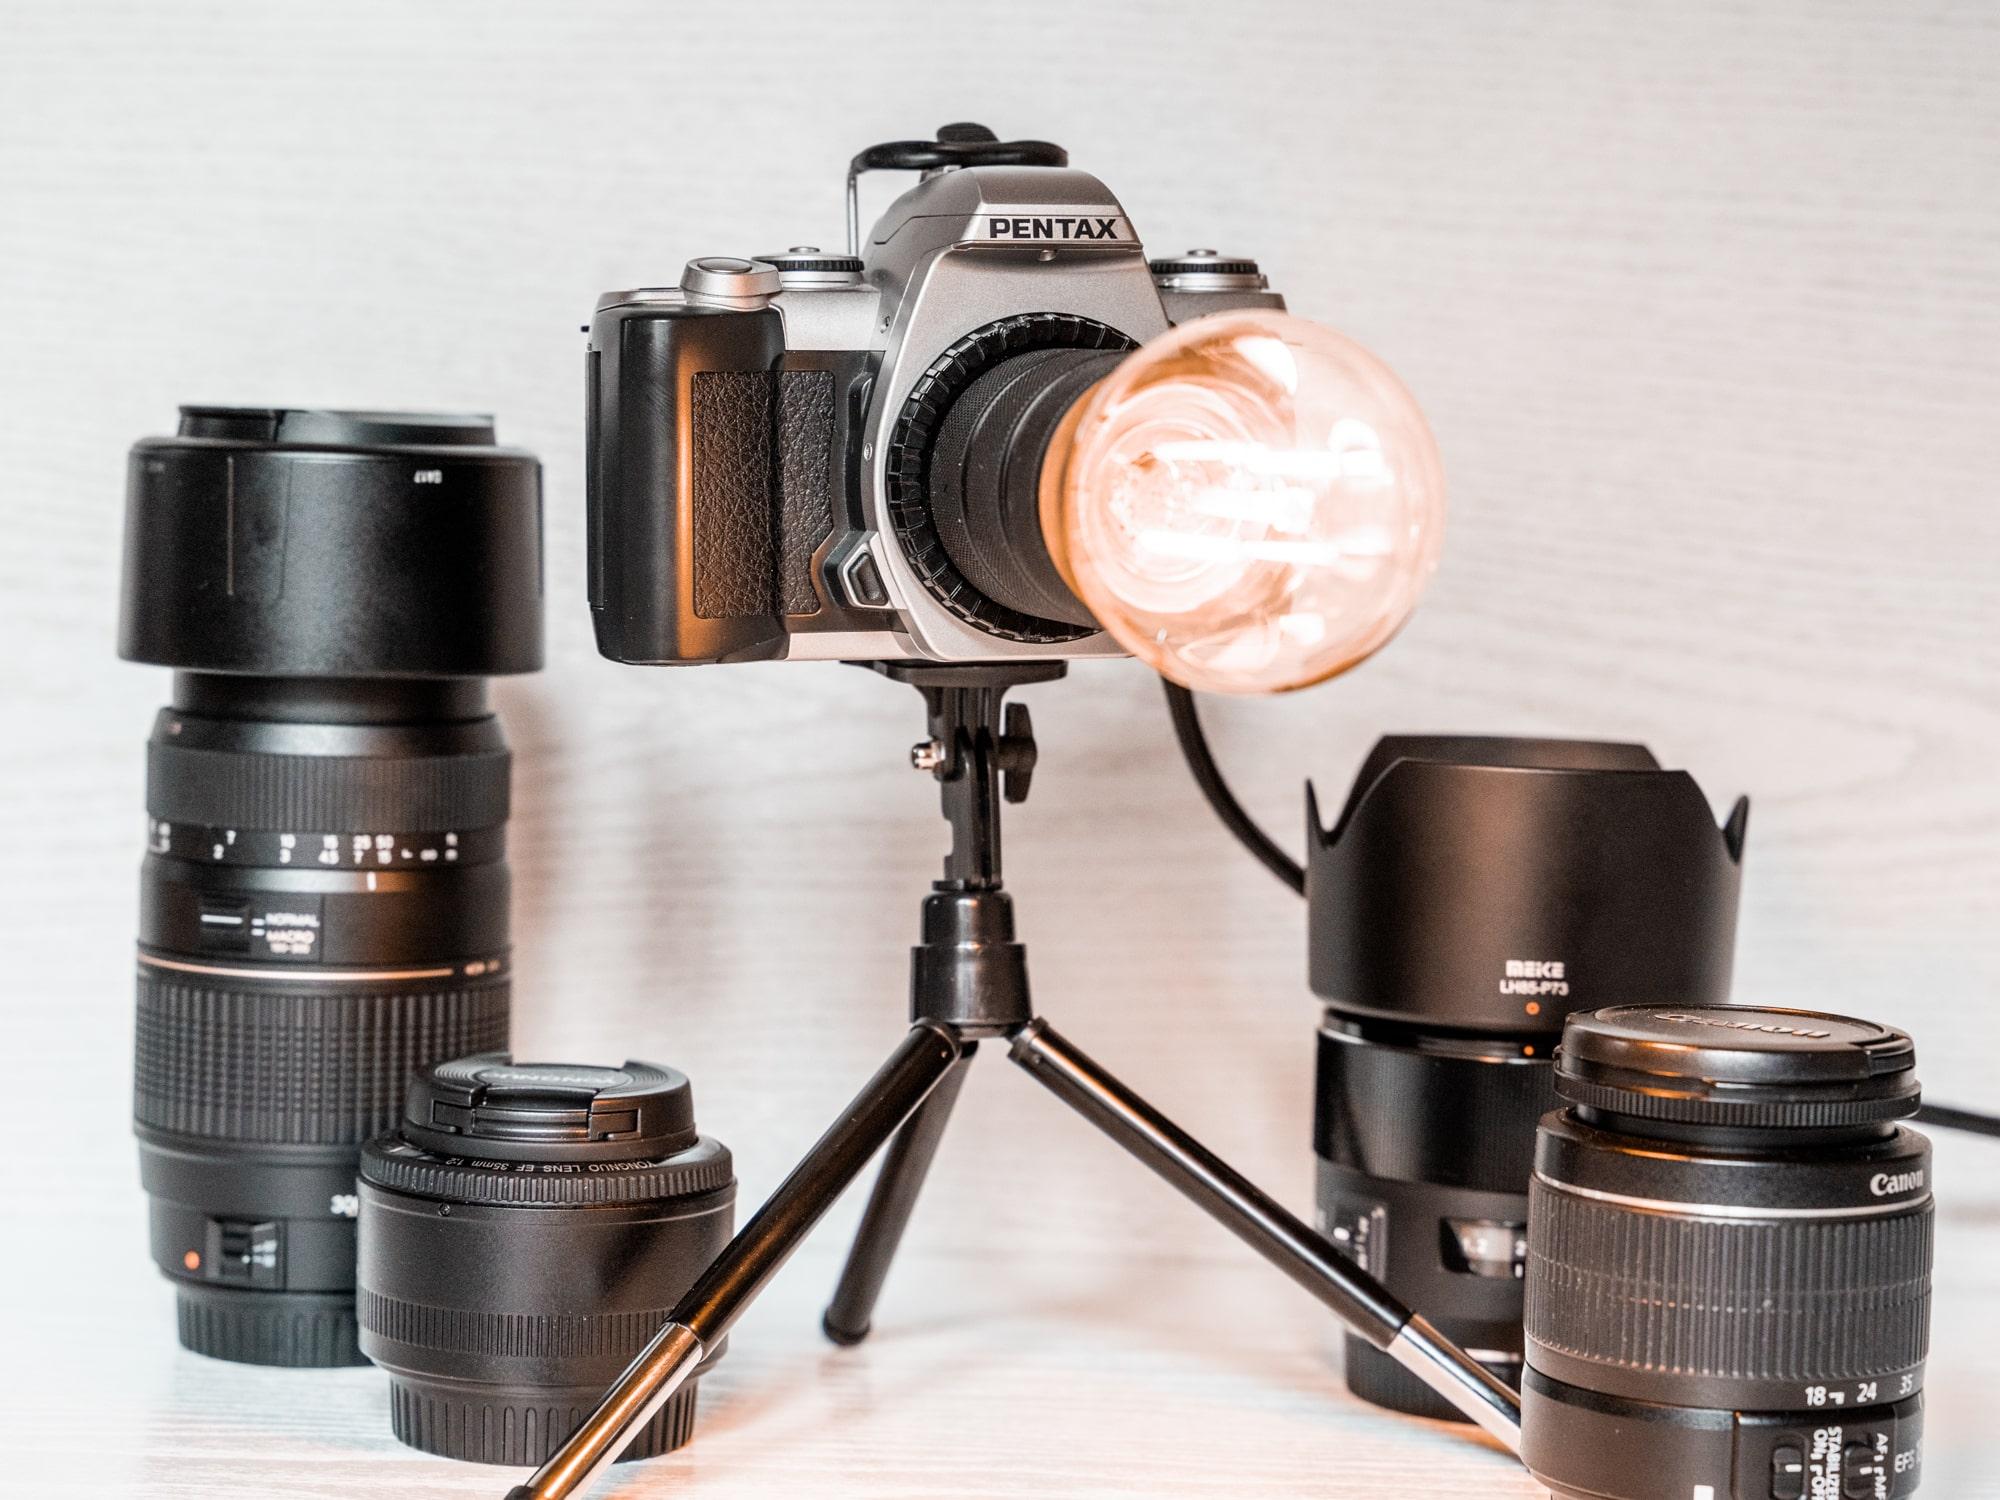 DIY Lampe aus alter Kamera basteln einfaches Upcycling Projekt